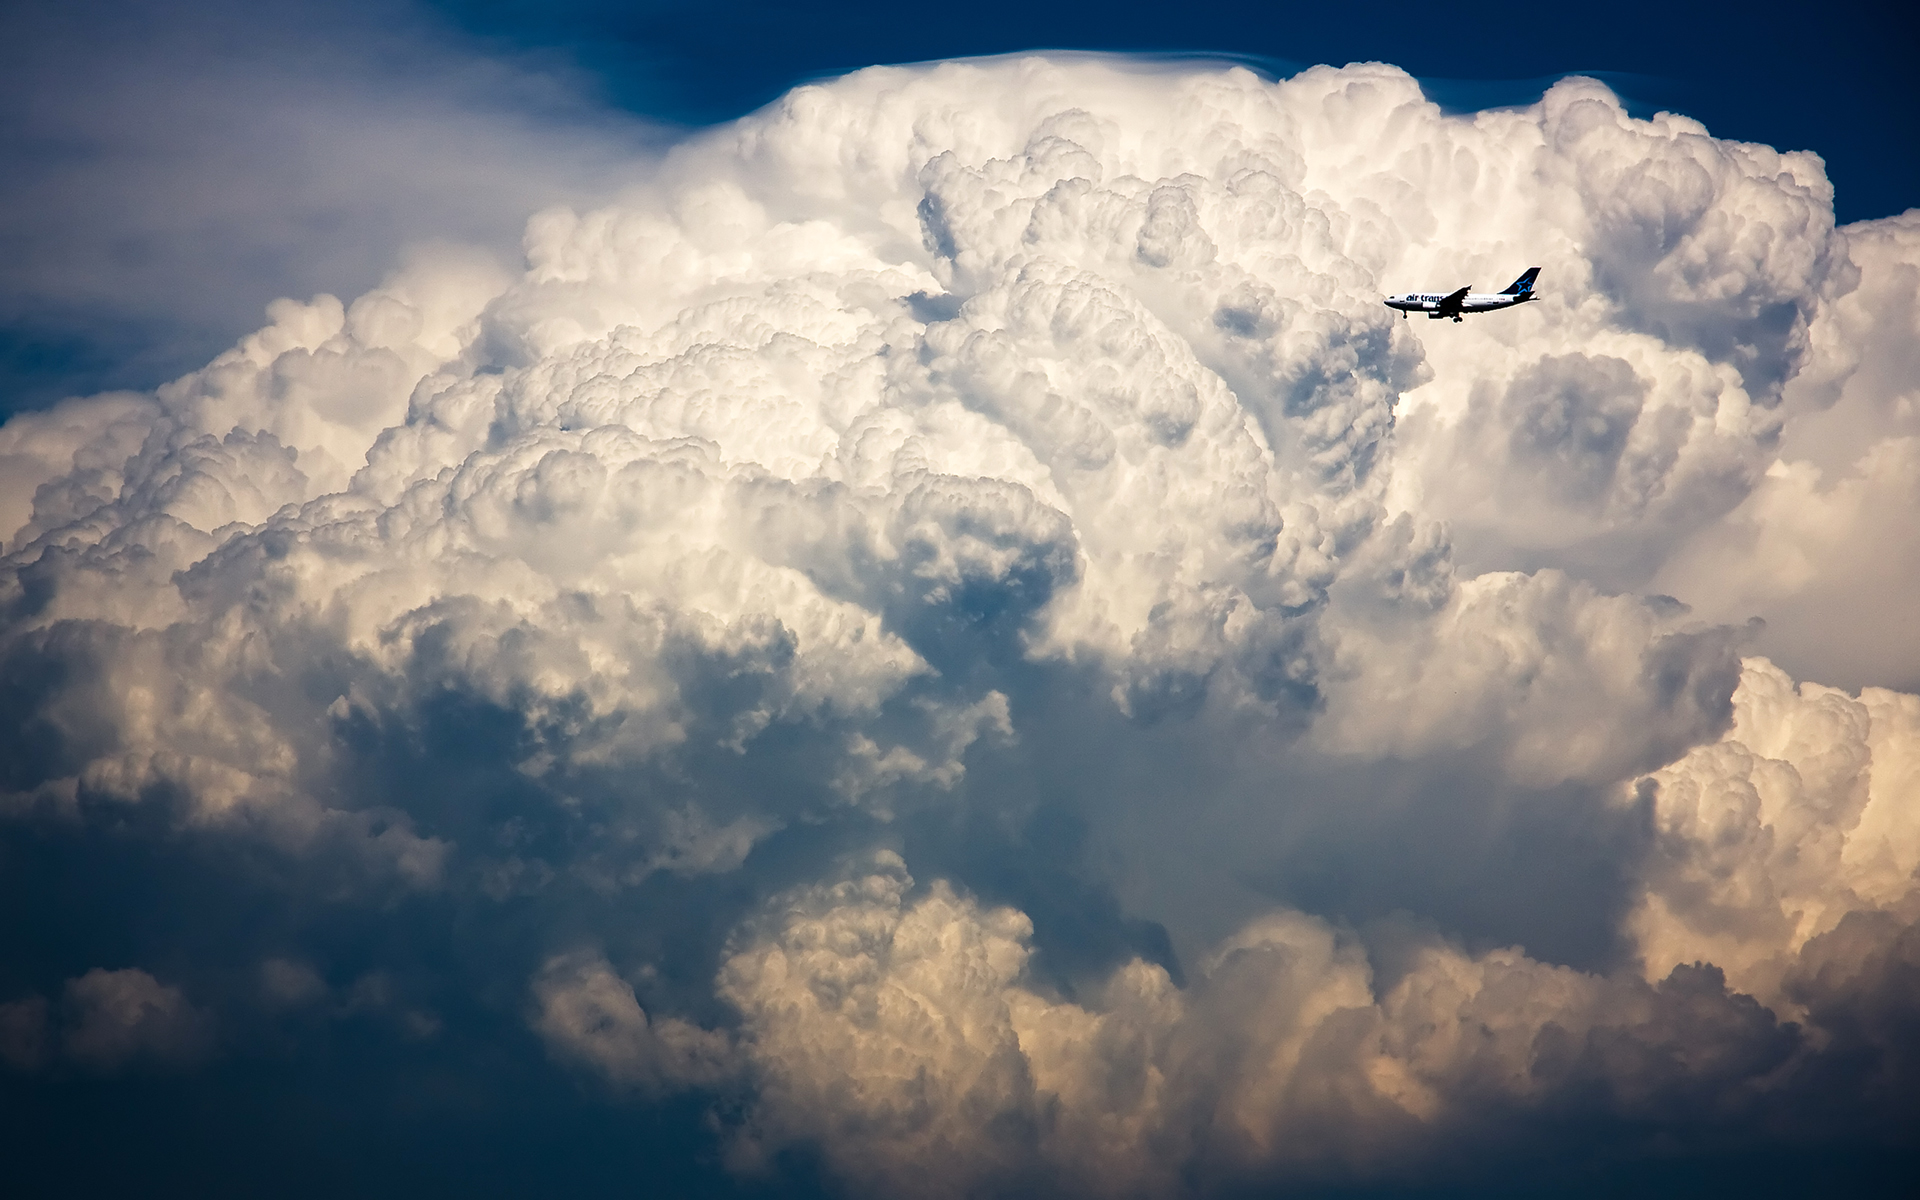 fondos nubes adnfriki (9)